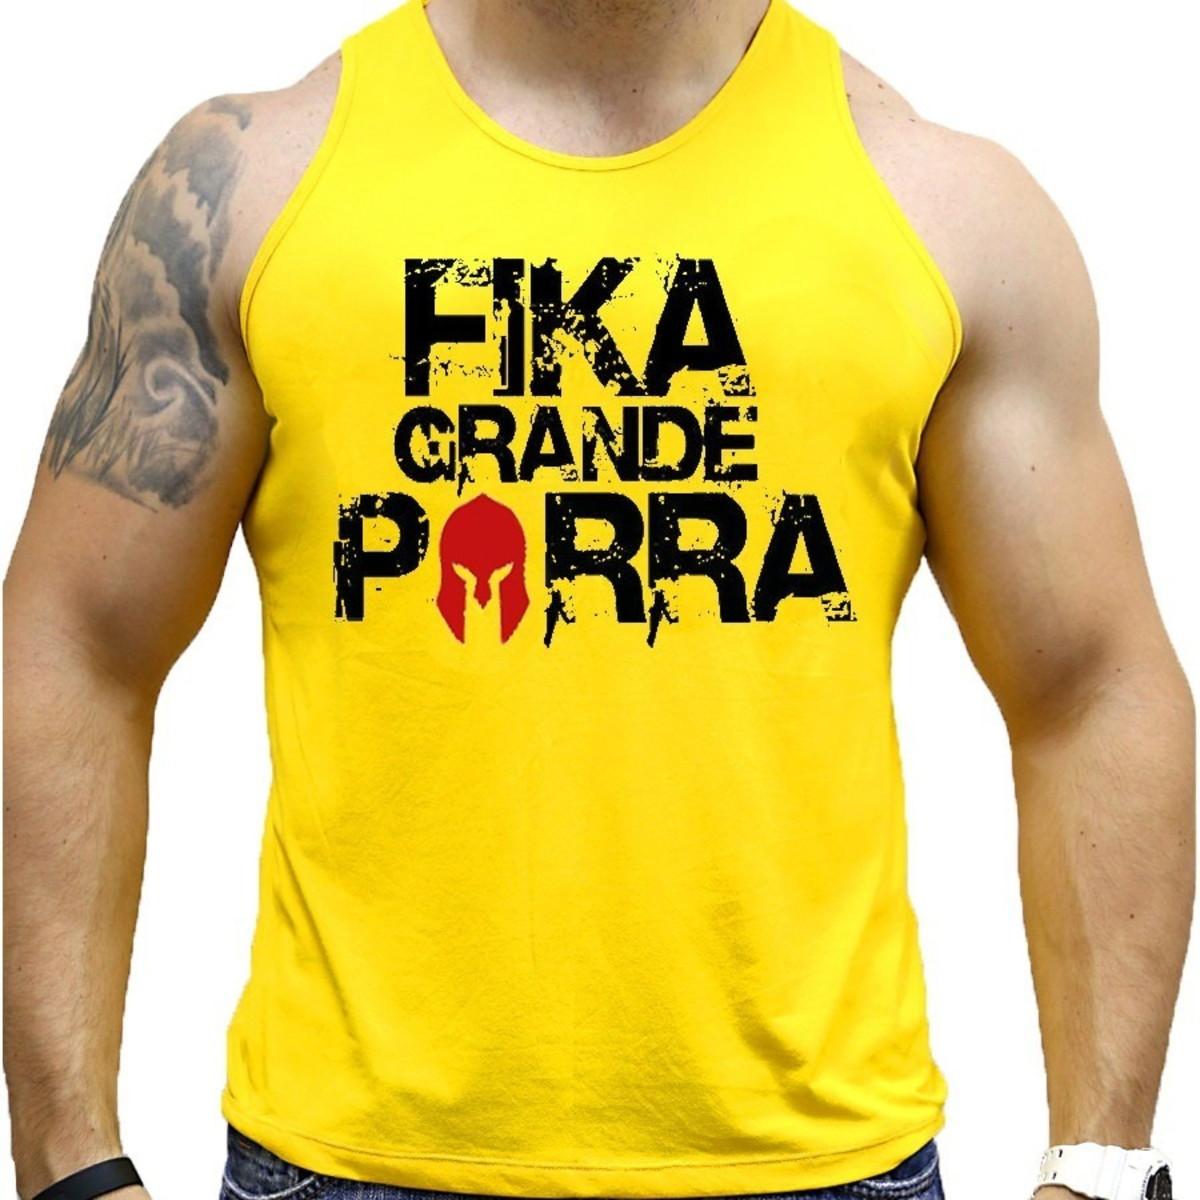 1e63bb809 Camiseta Regata Fika Grande Porra no Elo7